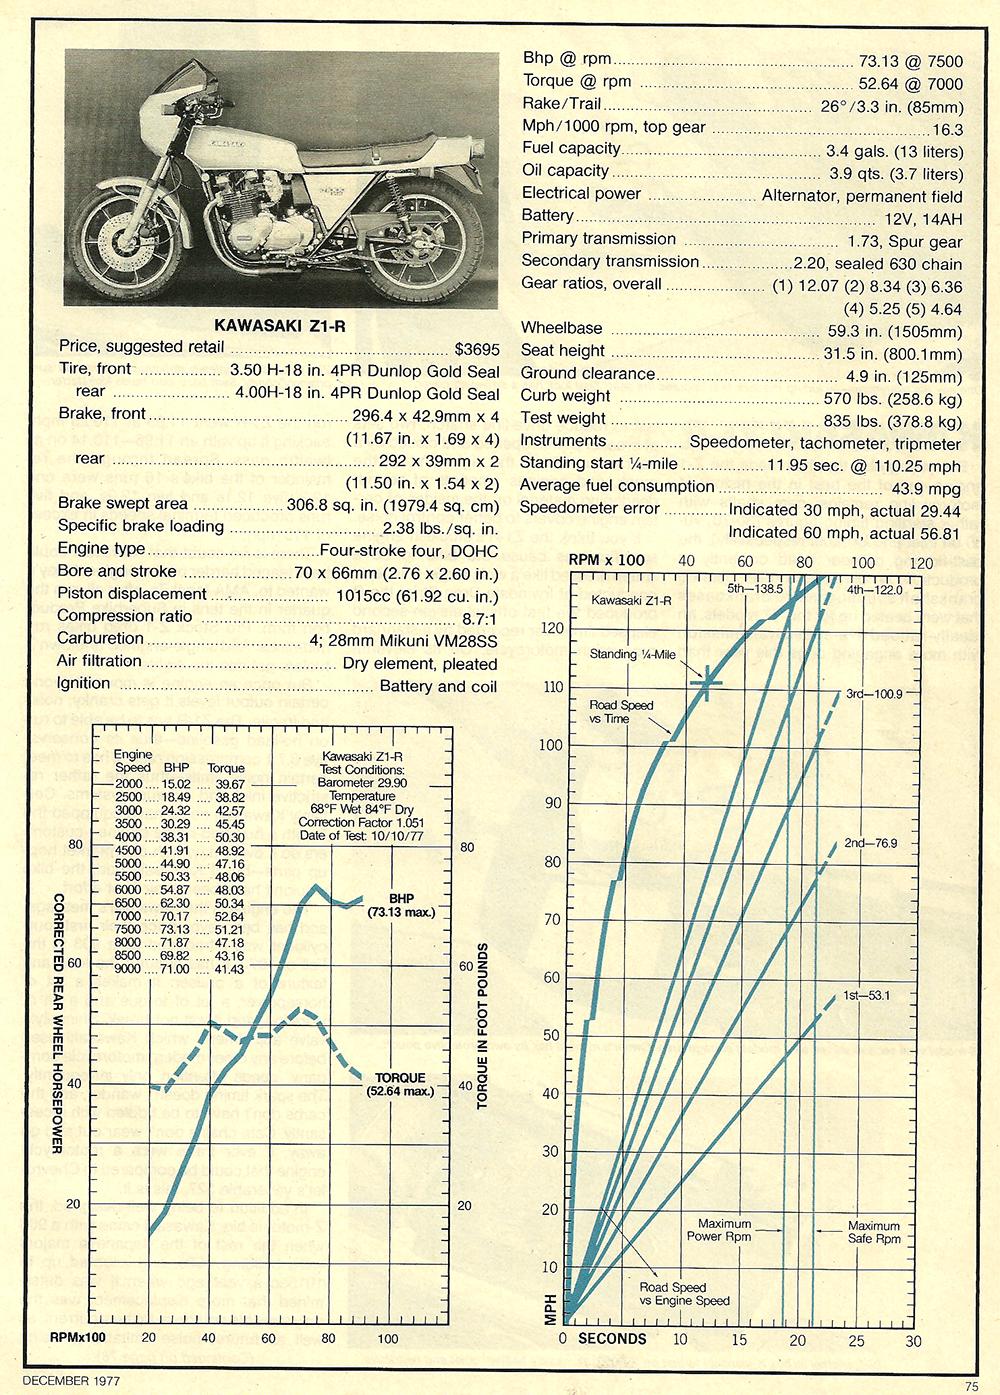 1977 Kawasaki Z1R road test 06.jpg